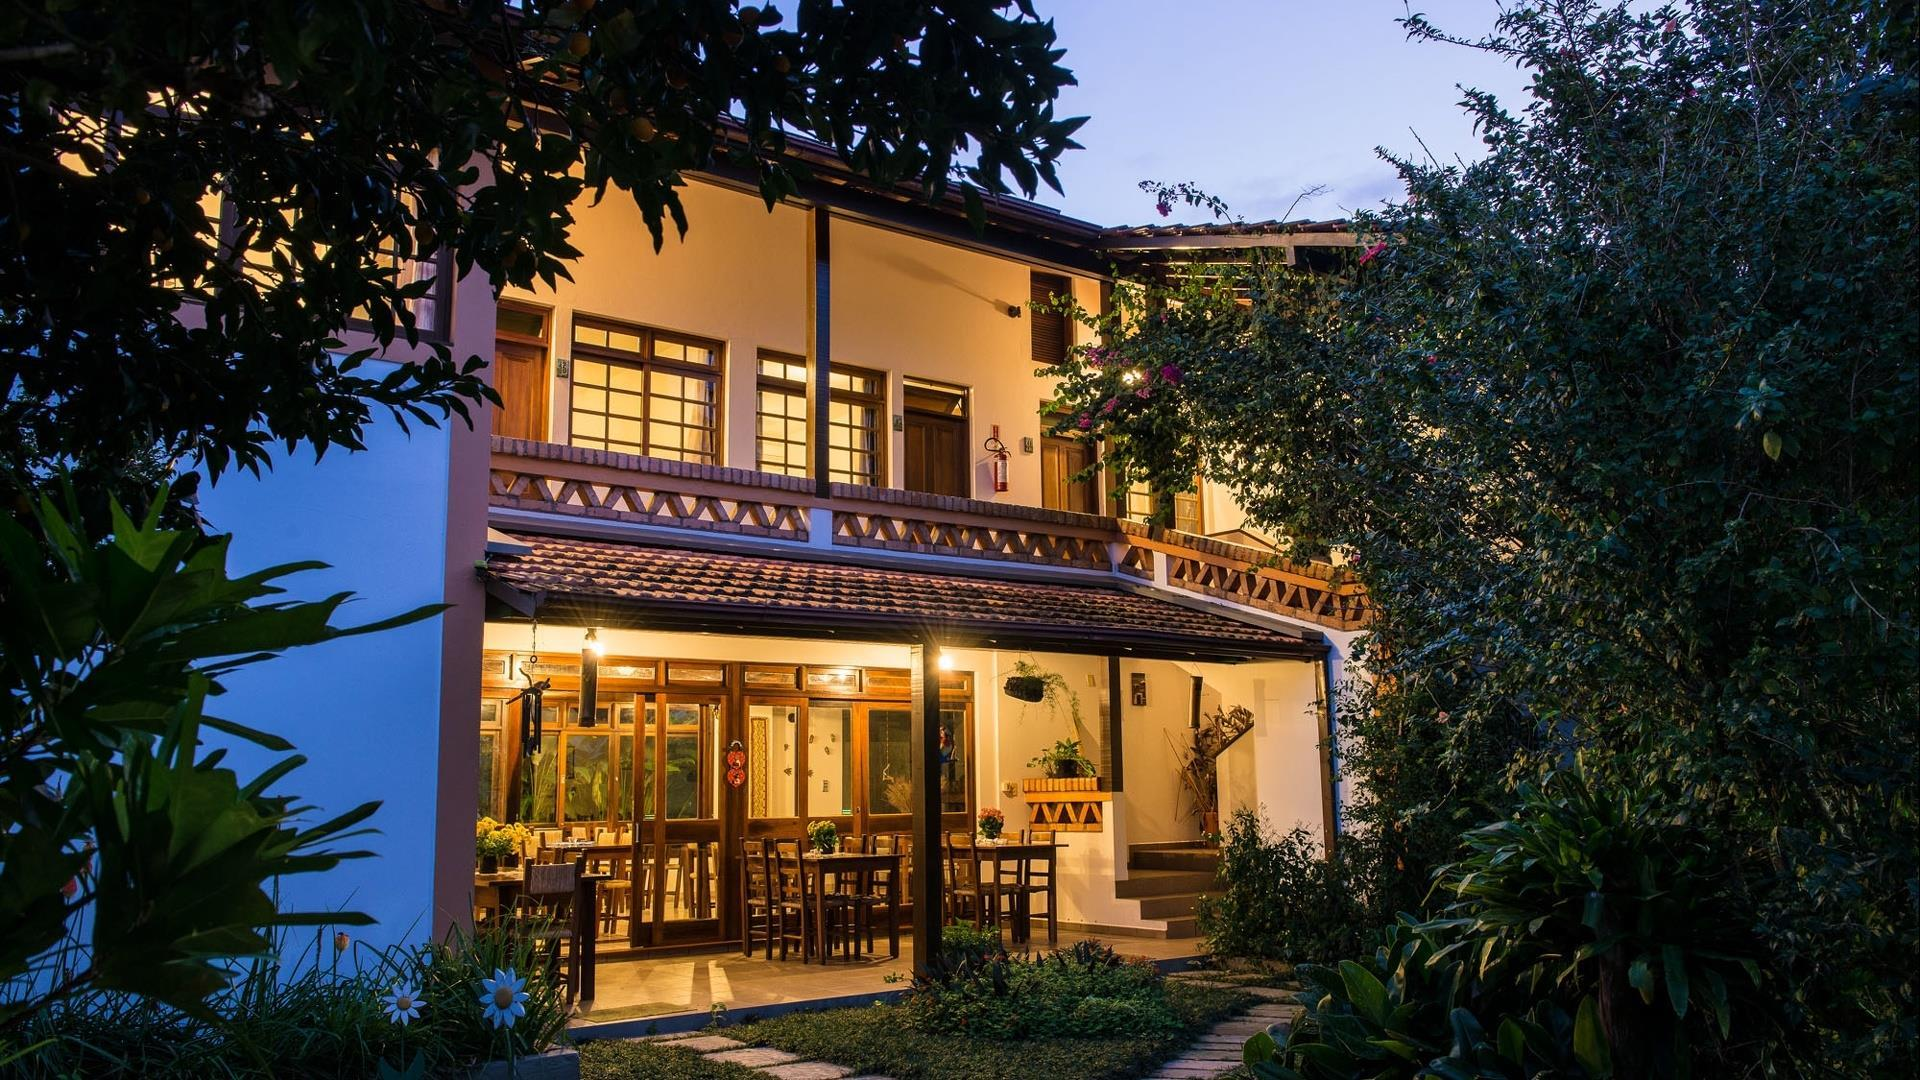 Brasilien Florianopolis: Standard Hotel - Hotel Natur Campeche